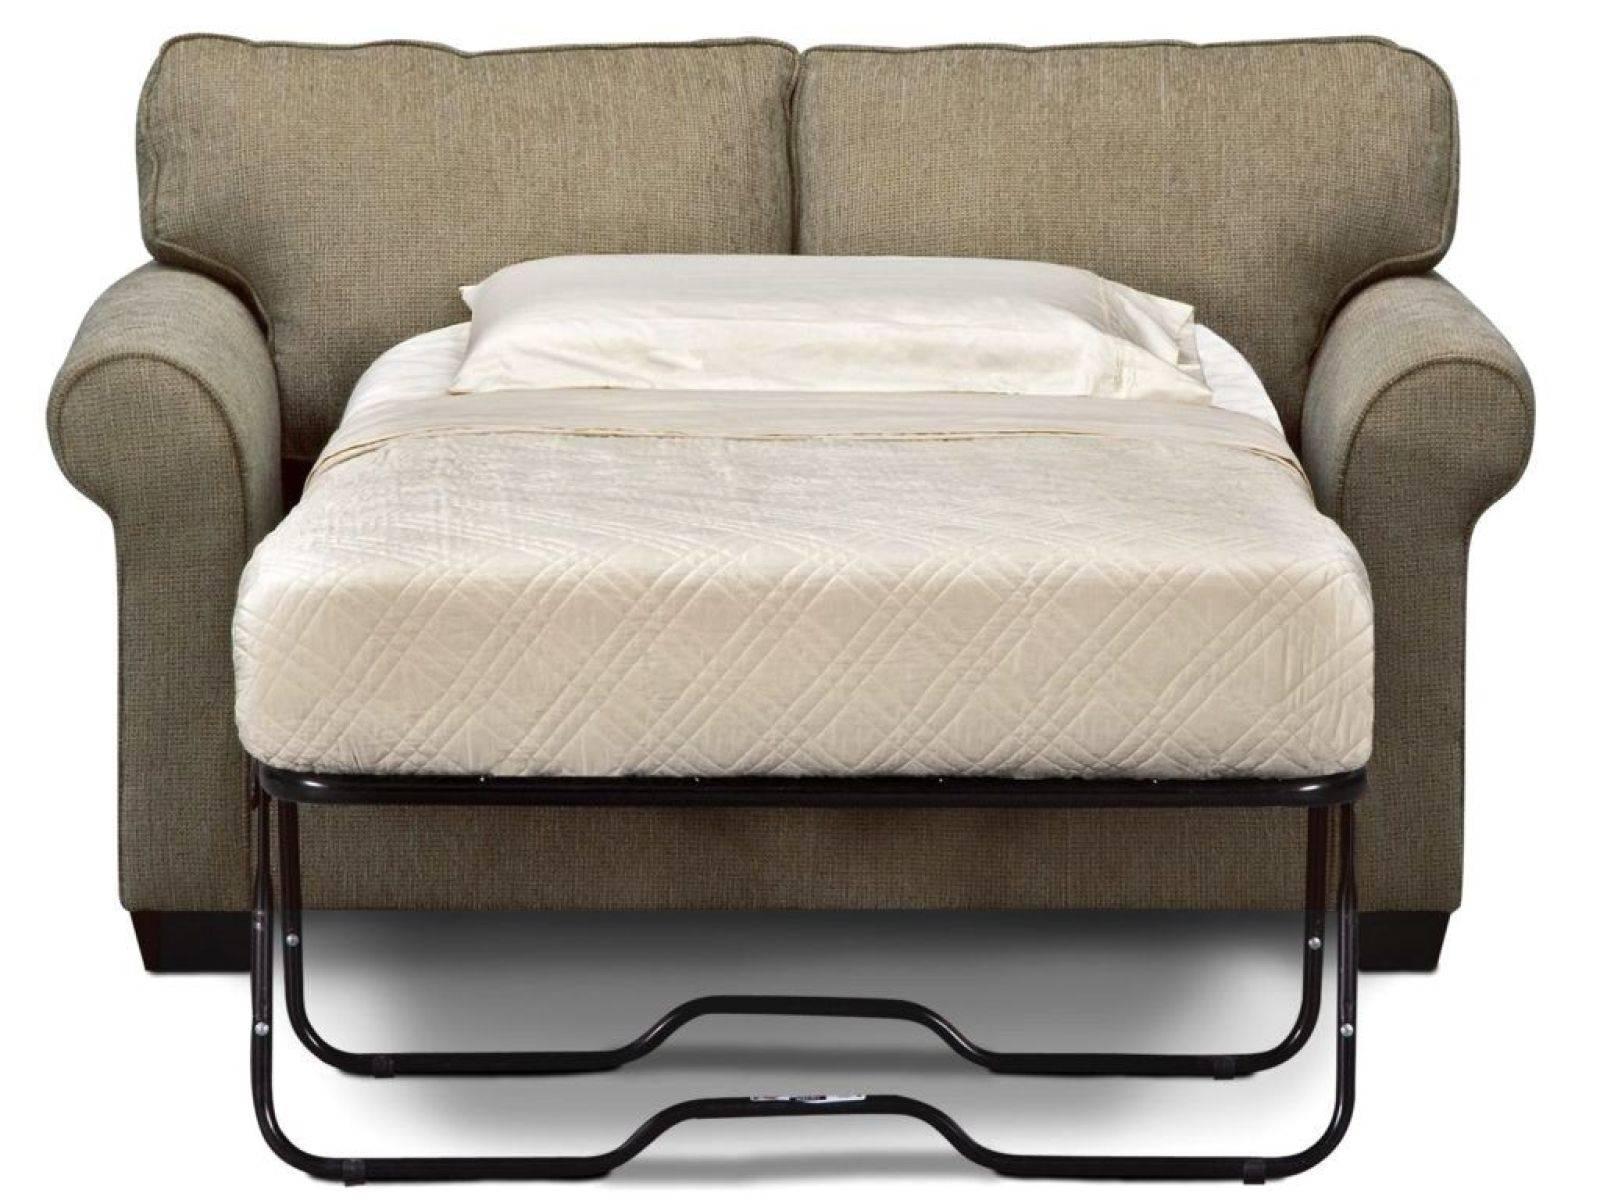 loveseat multiple mainstays walmart colors dorm futons room com pin futon contempo